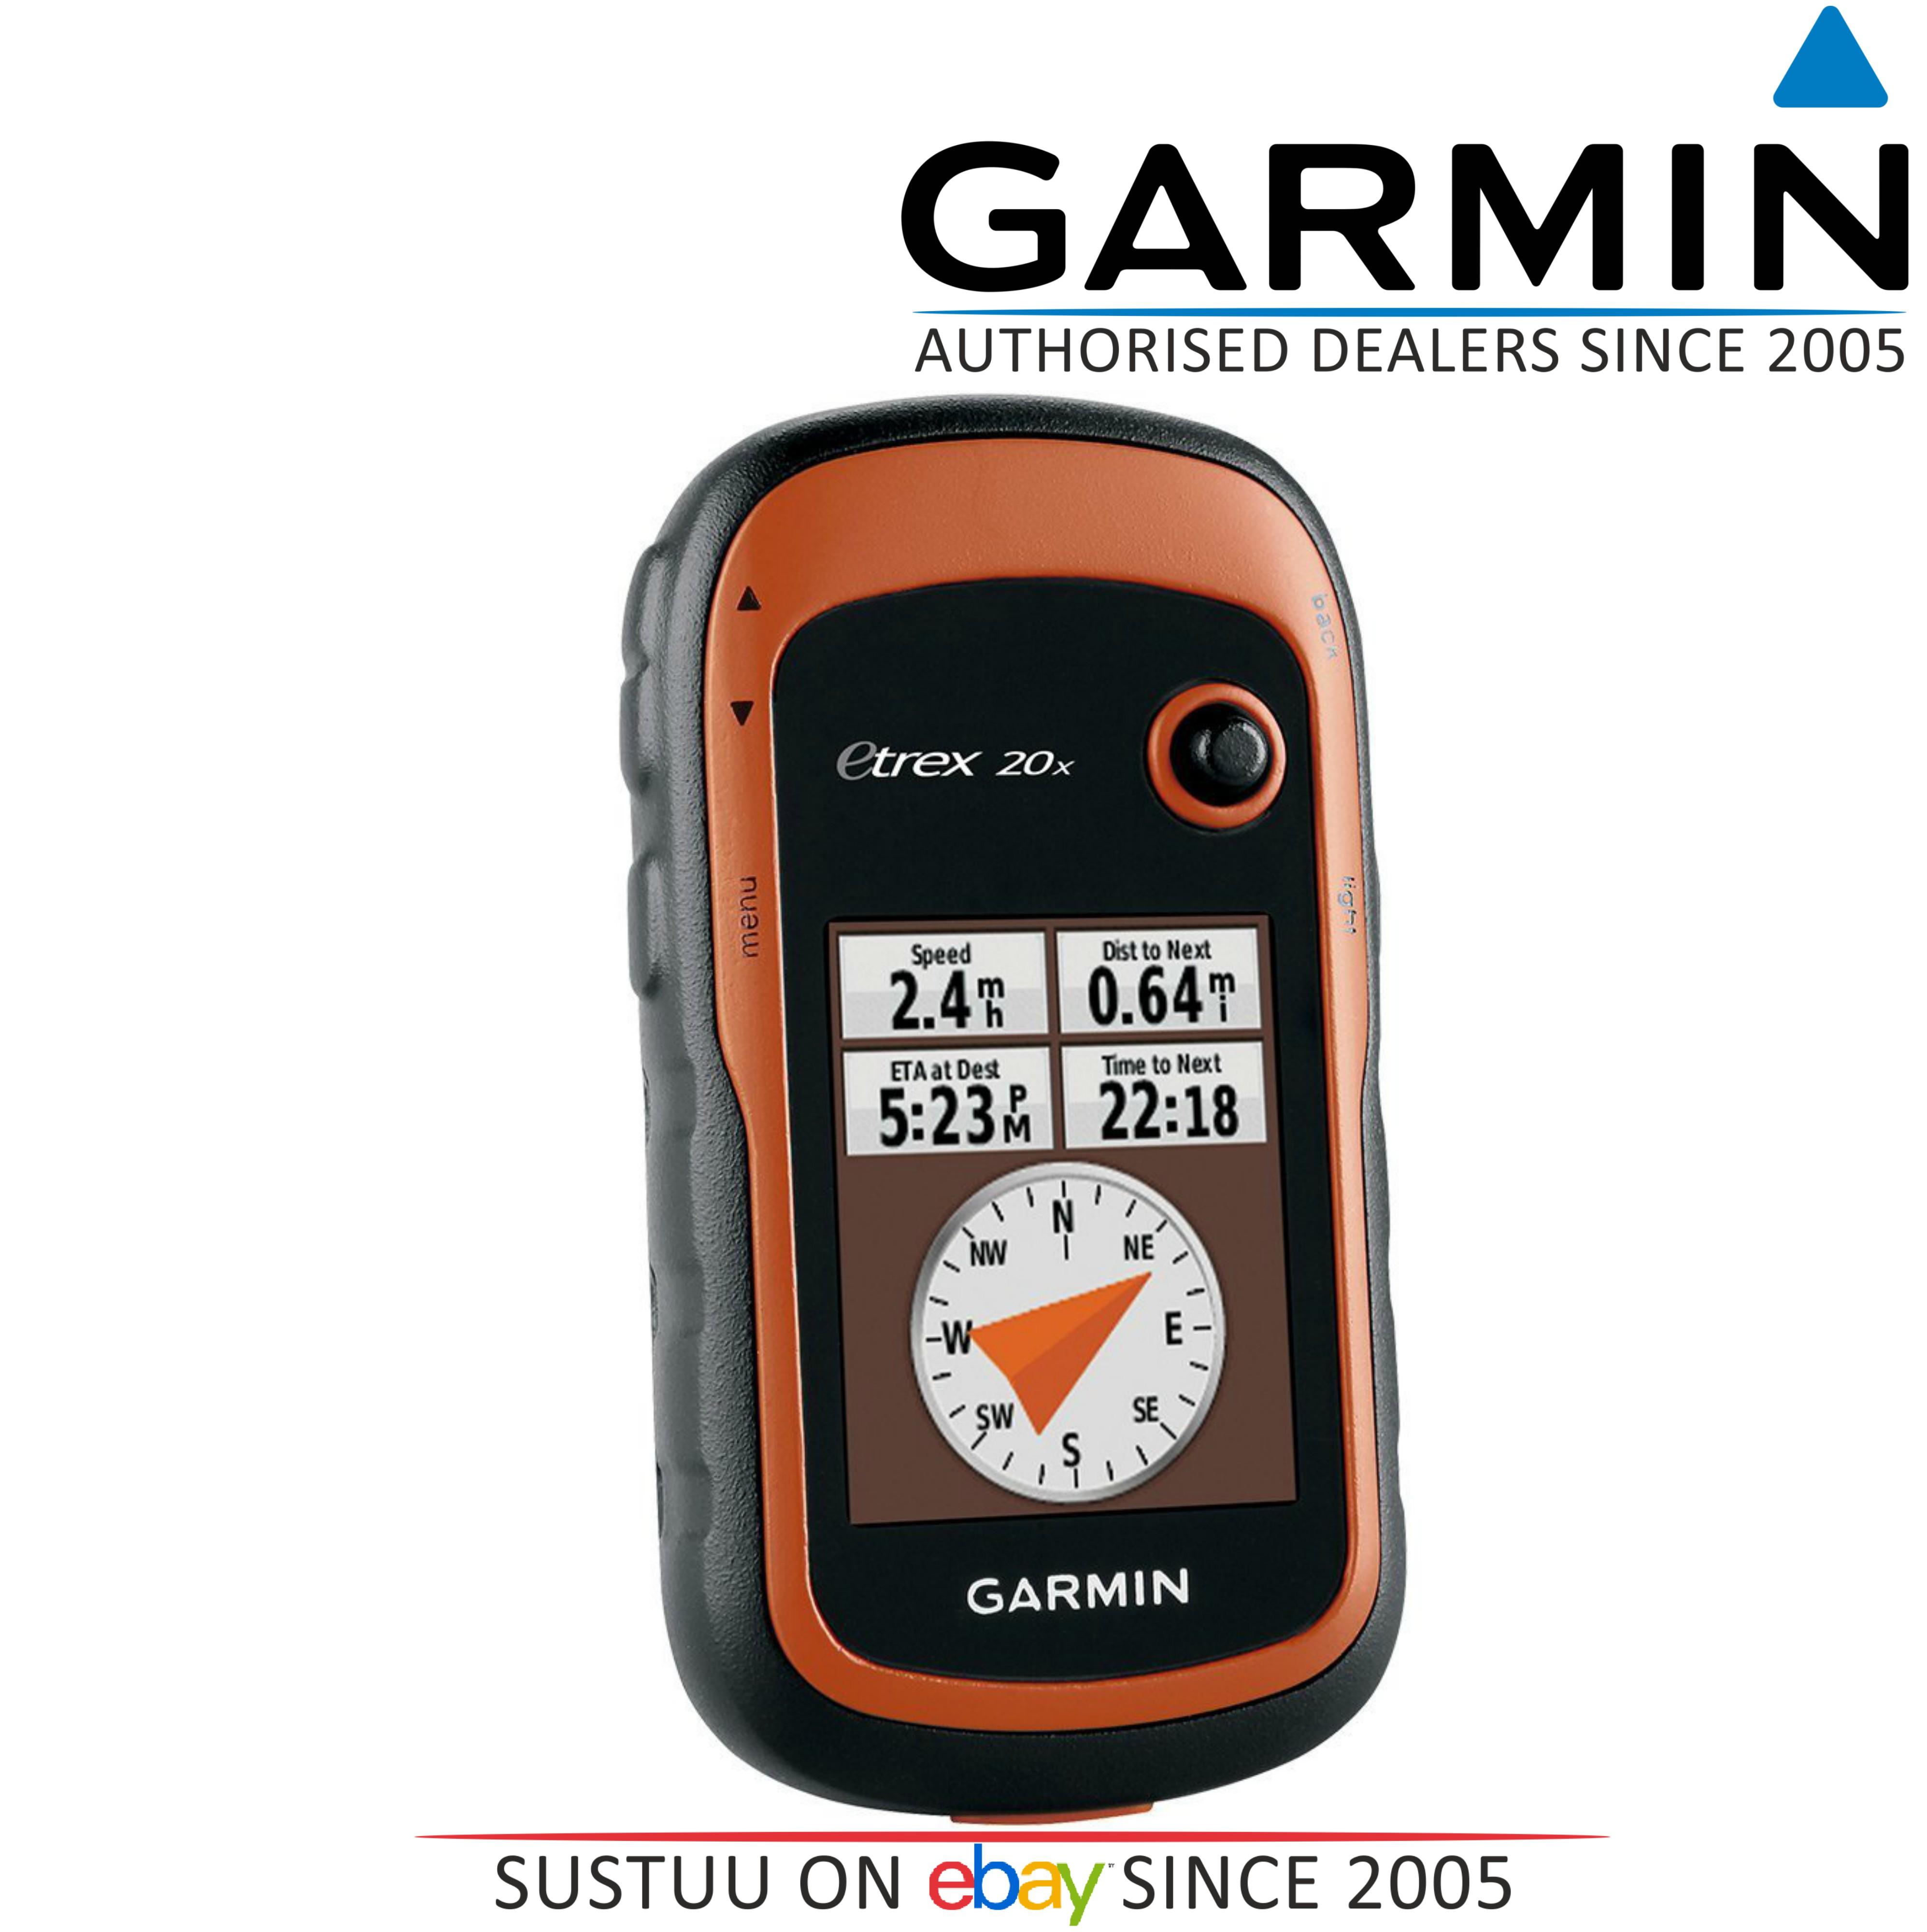 Garmin Etrex 20x Outdoor Handheld GPS-GLONASS Hiking-Walking *Worldwide Basemap